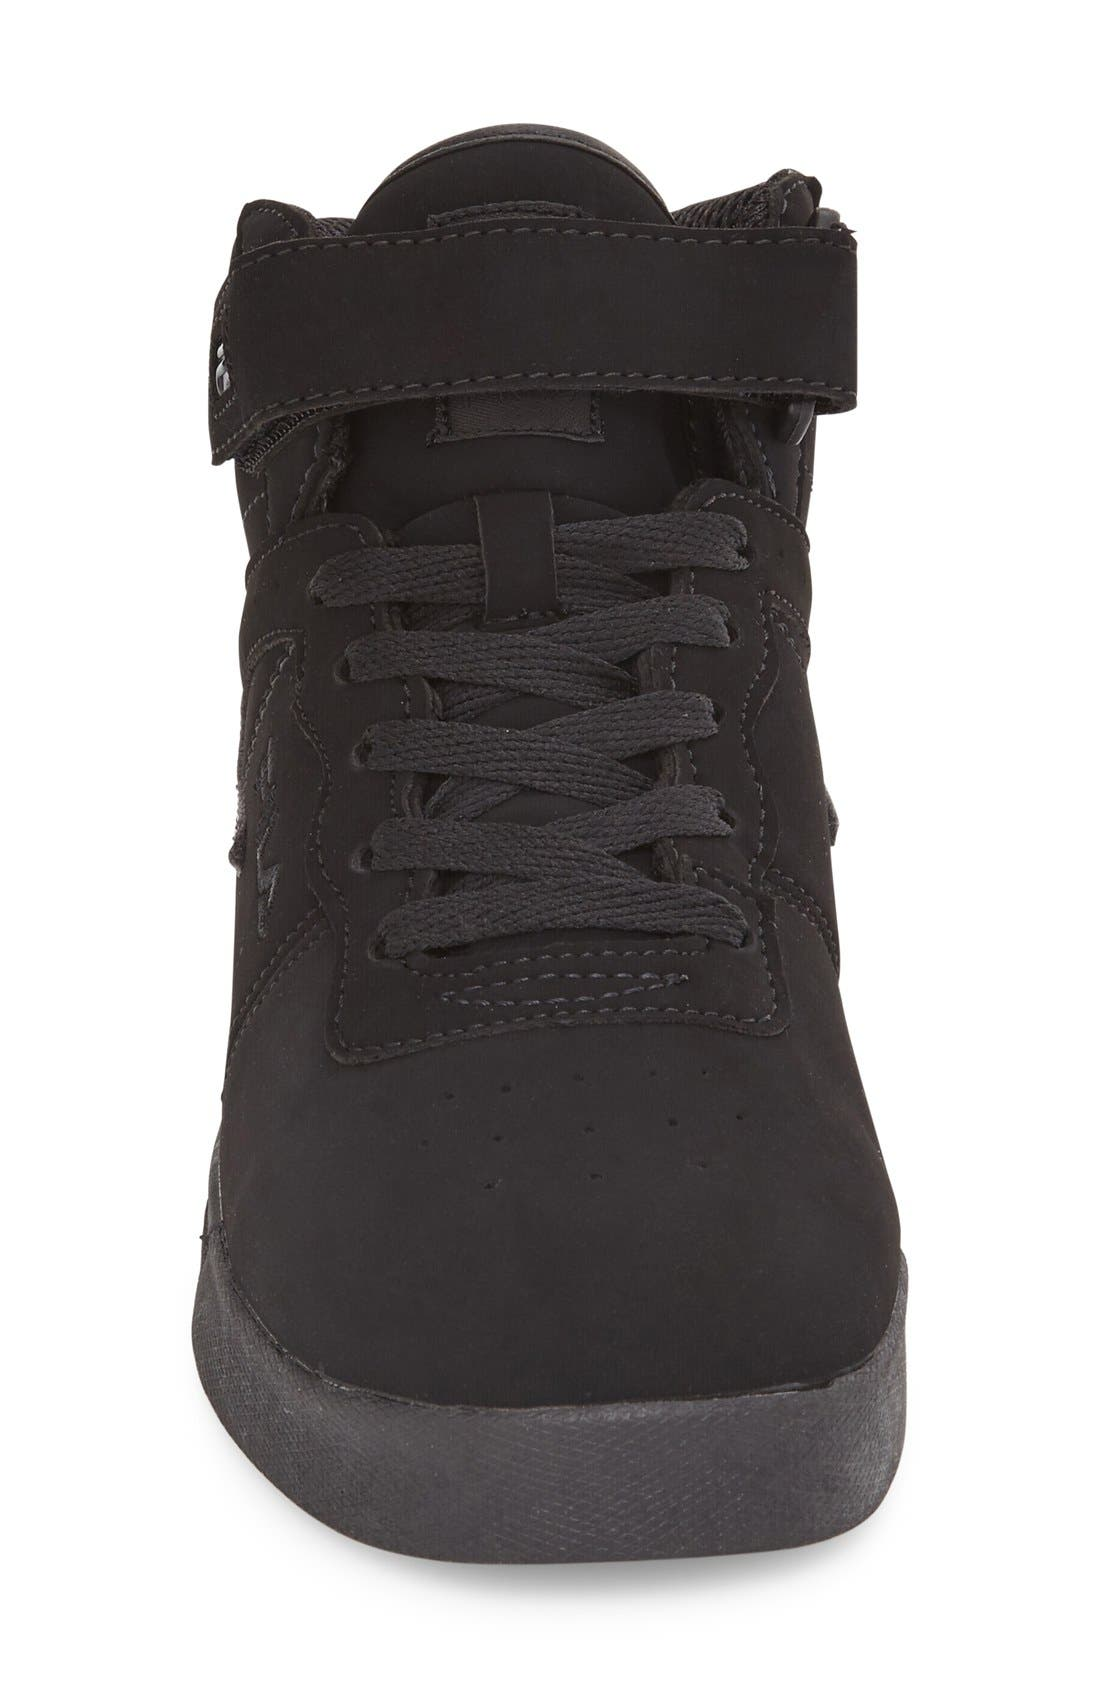 Vulc 13 High Top Sneaker,                             Alternate thumbnail 3, color,                             001